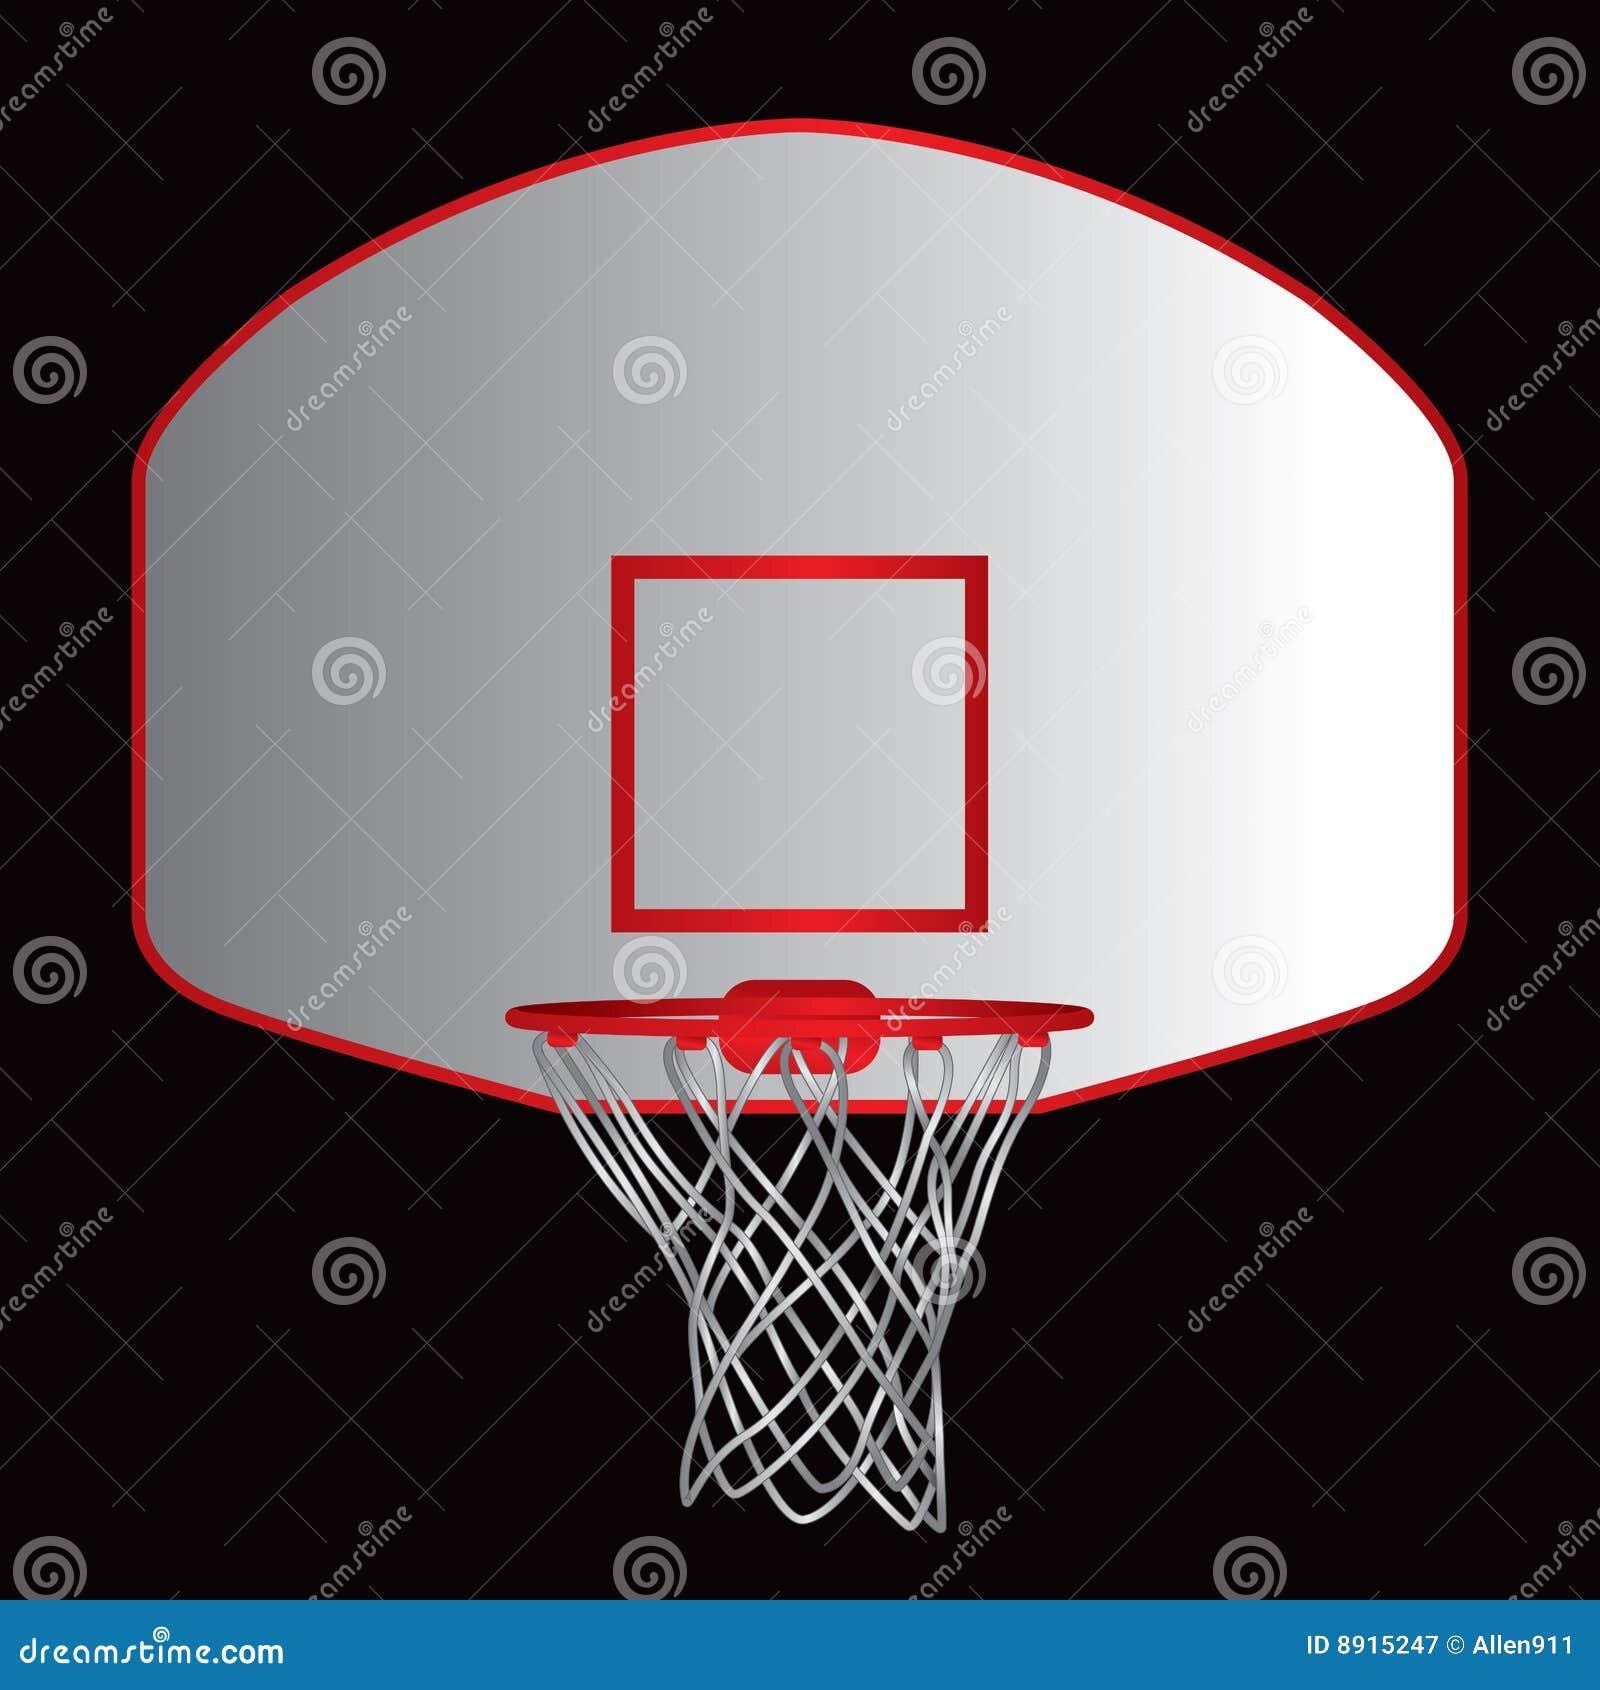 Basketball Backboard Royalty Free Stock Photography